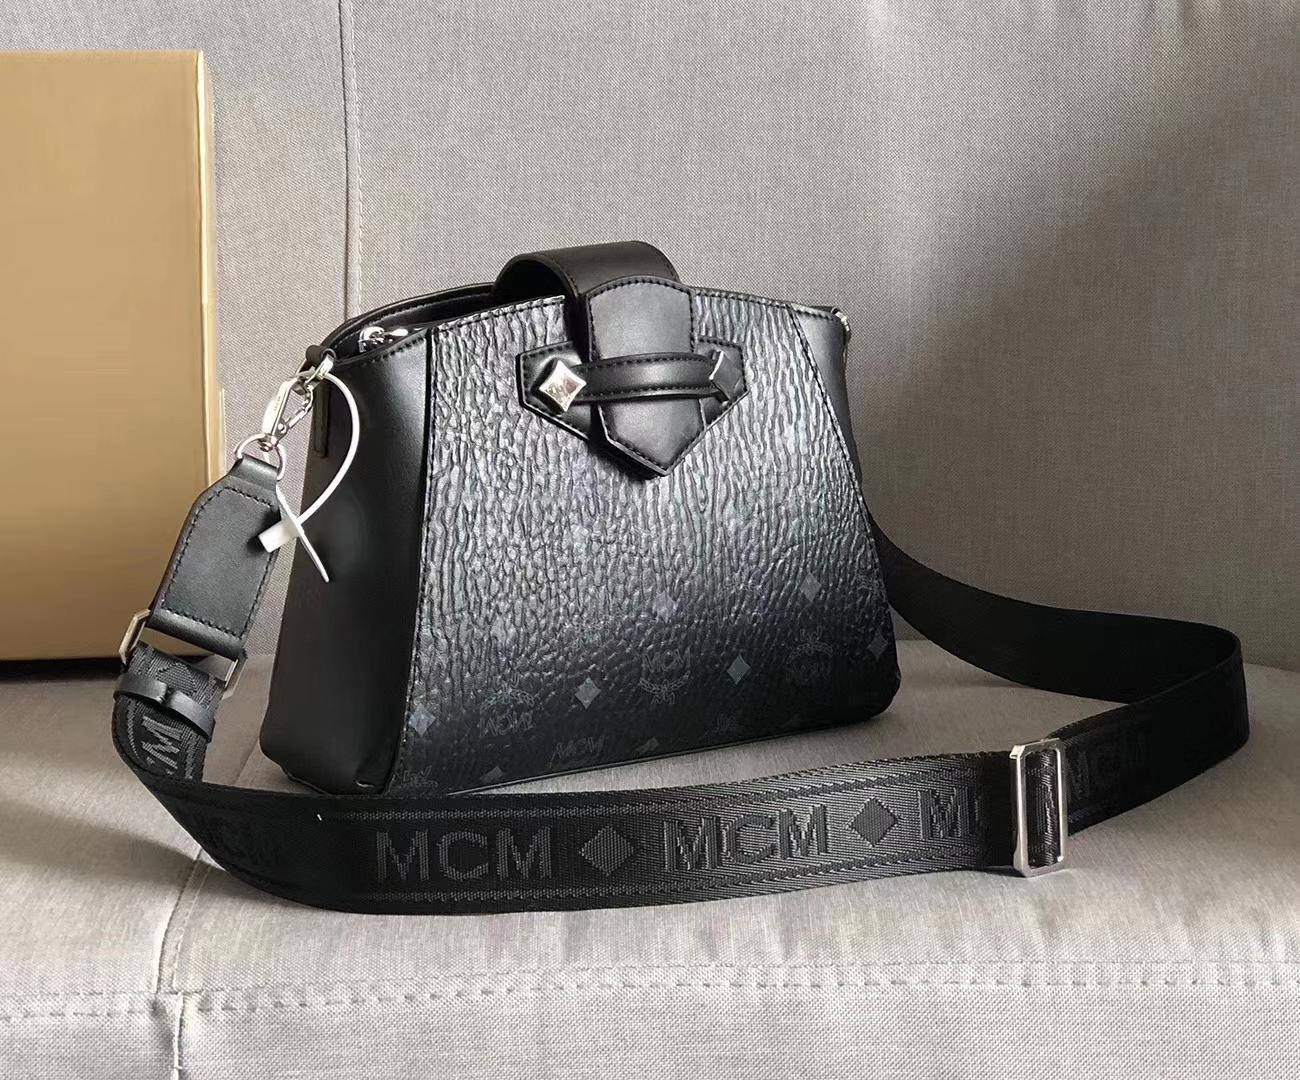 MCM新款 Essential斜挎包 经典Visetos材料制成 磁吸搭扣闭合